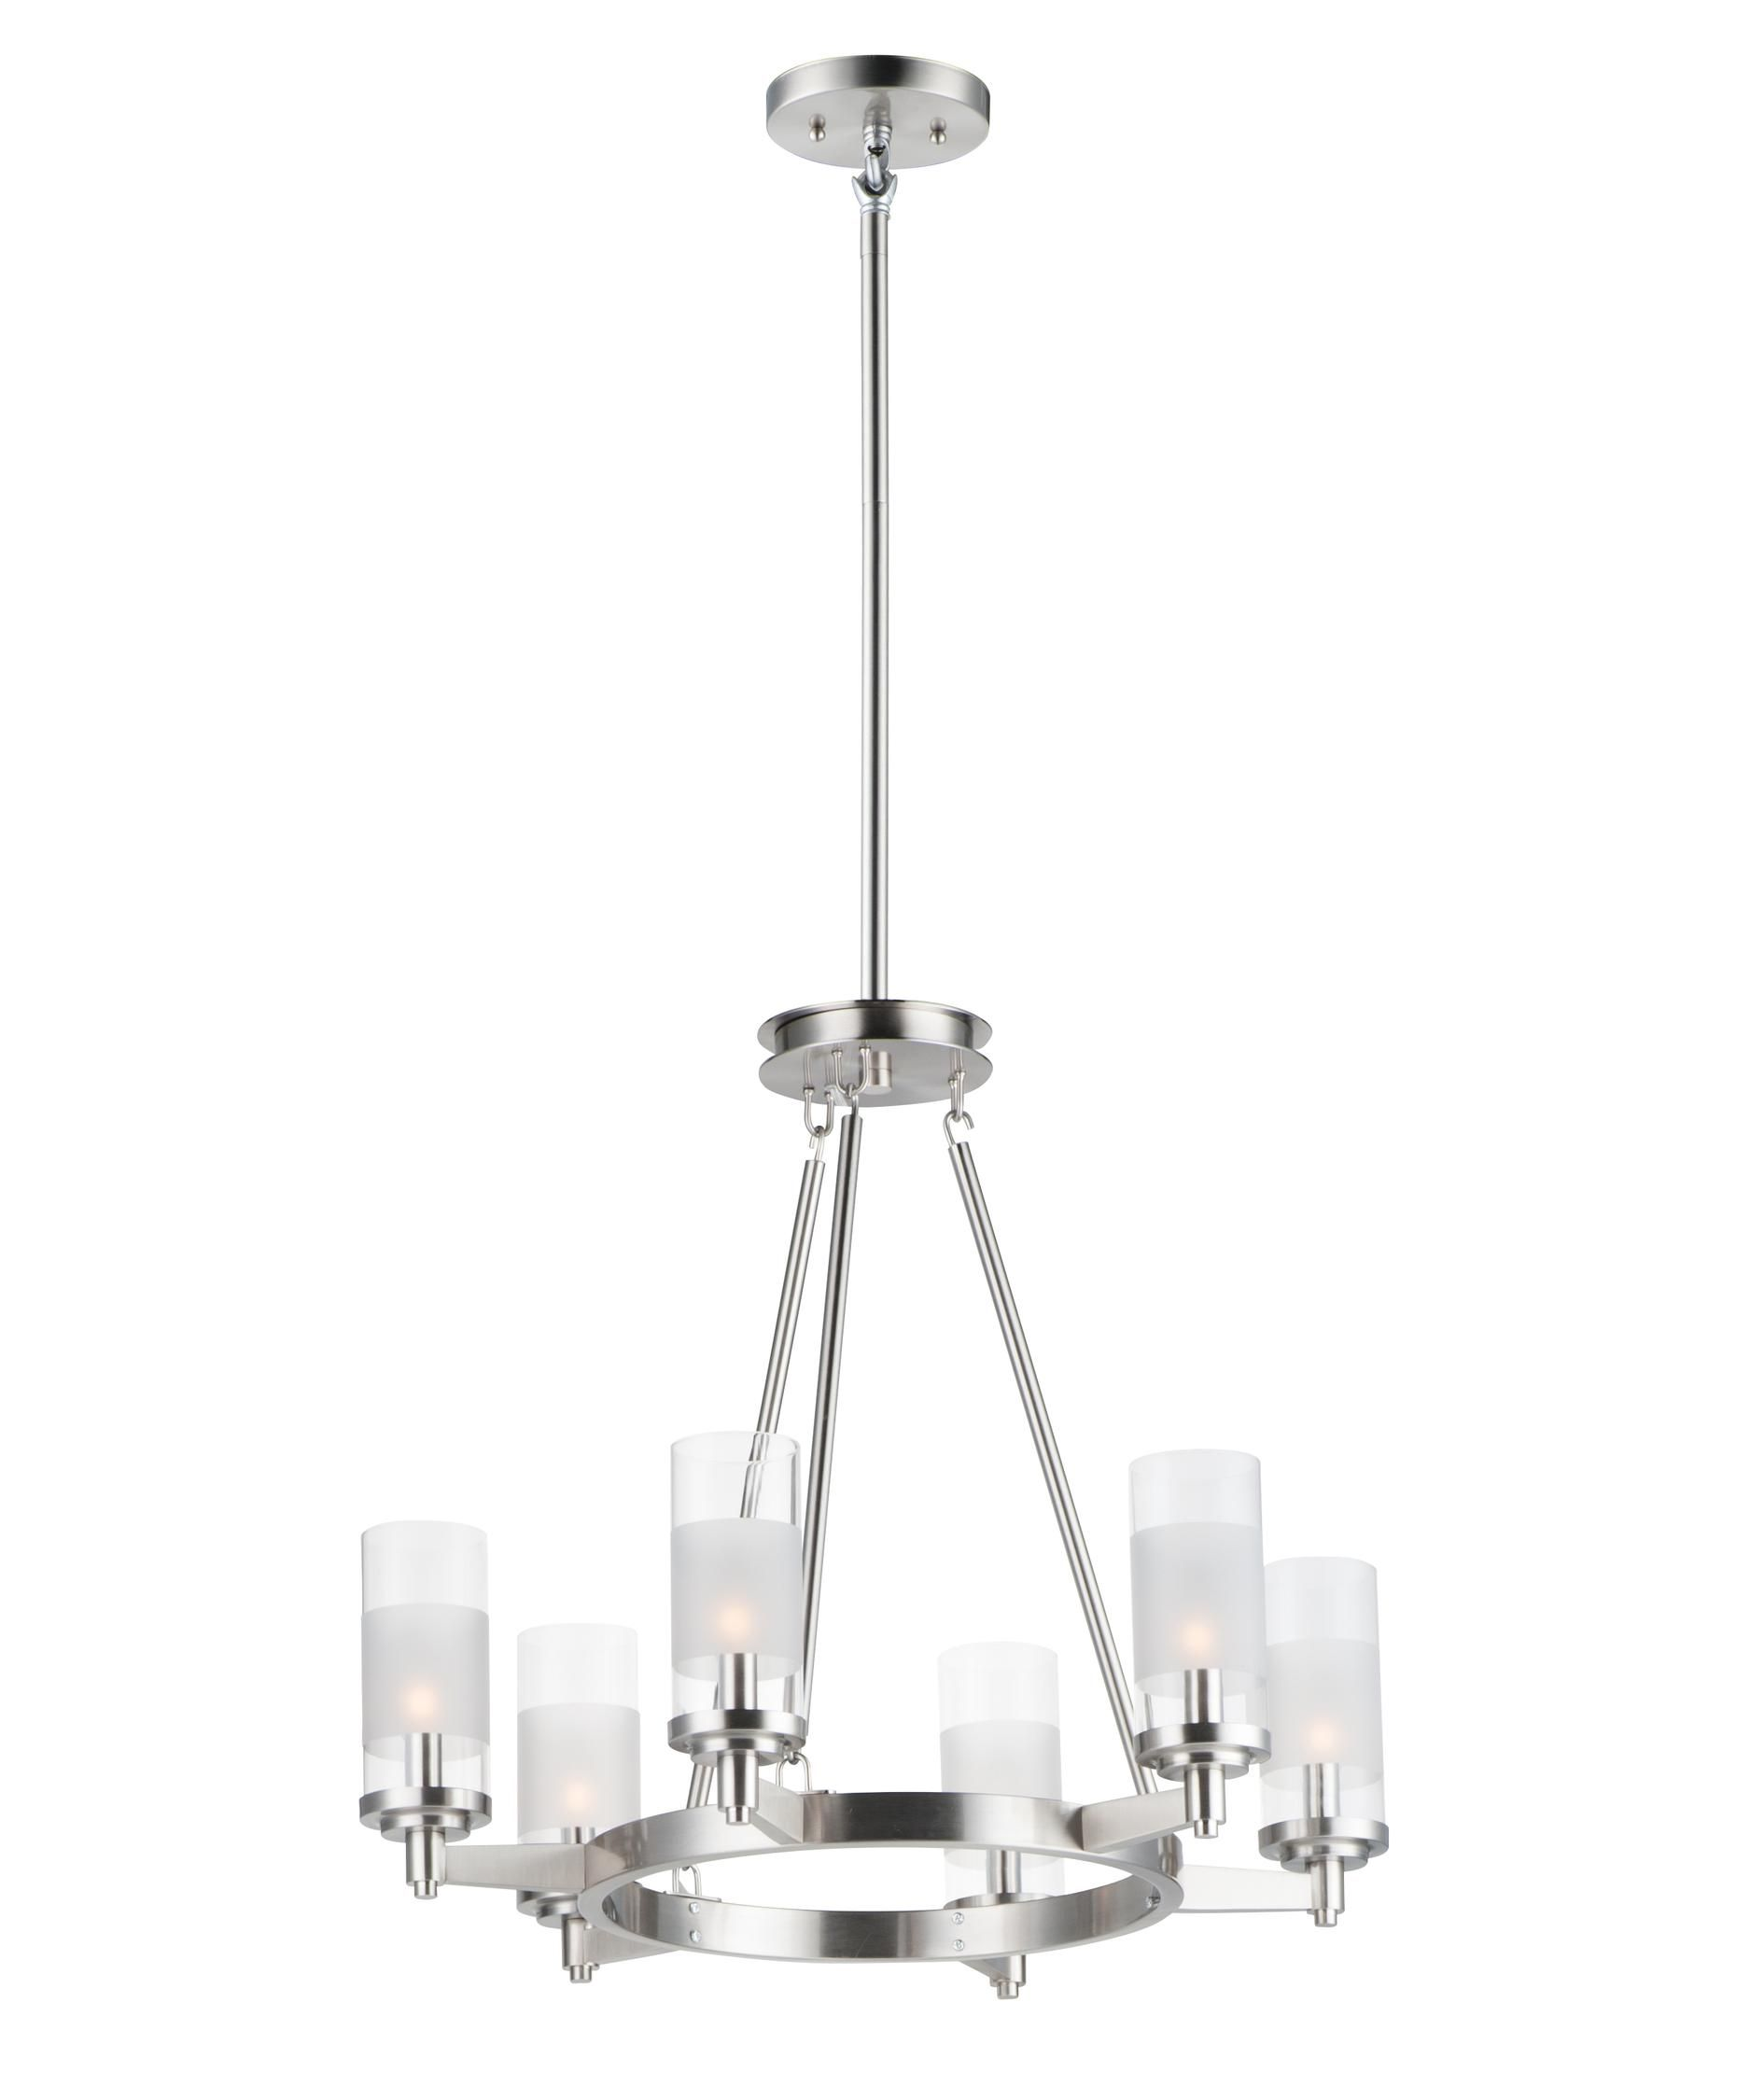 Crescendo 24 Inch 6 Light Chandelier By Maxim Lighting Lighting